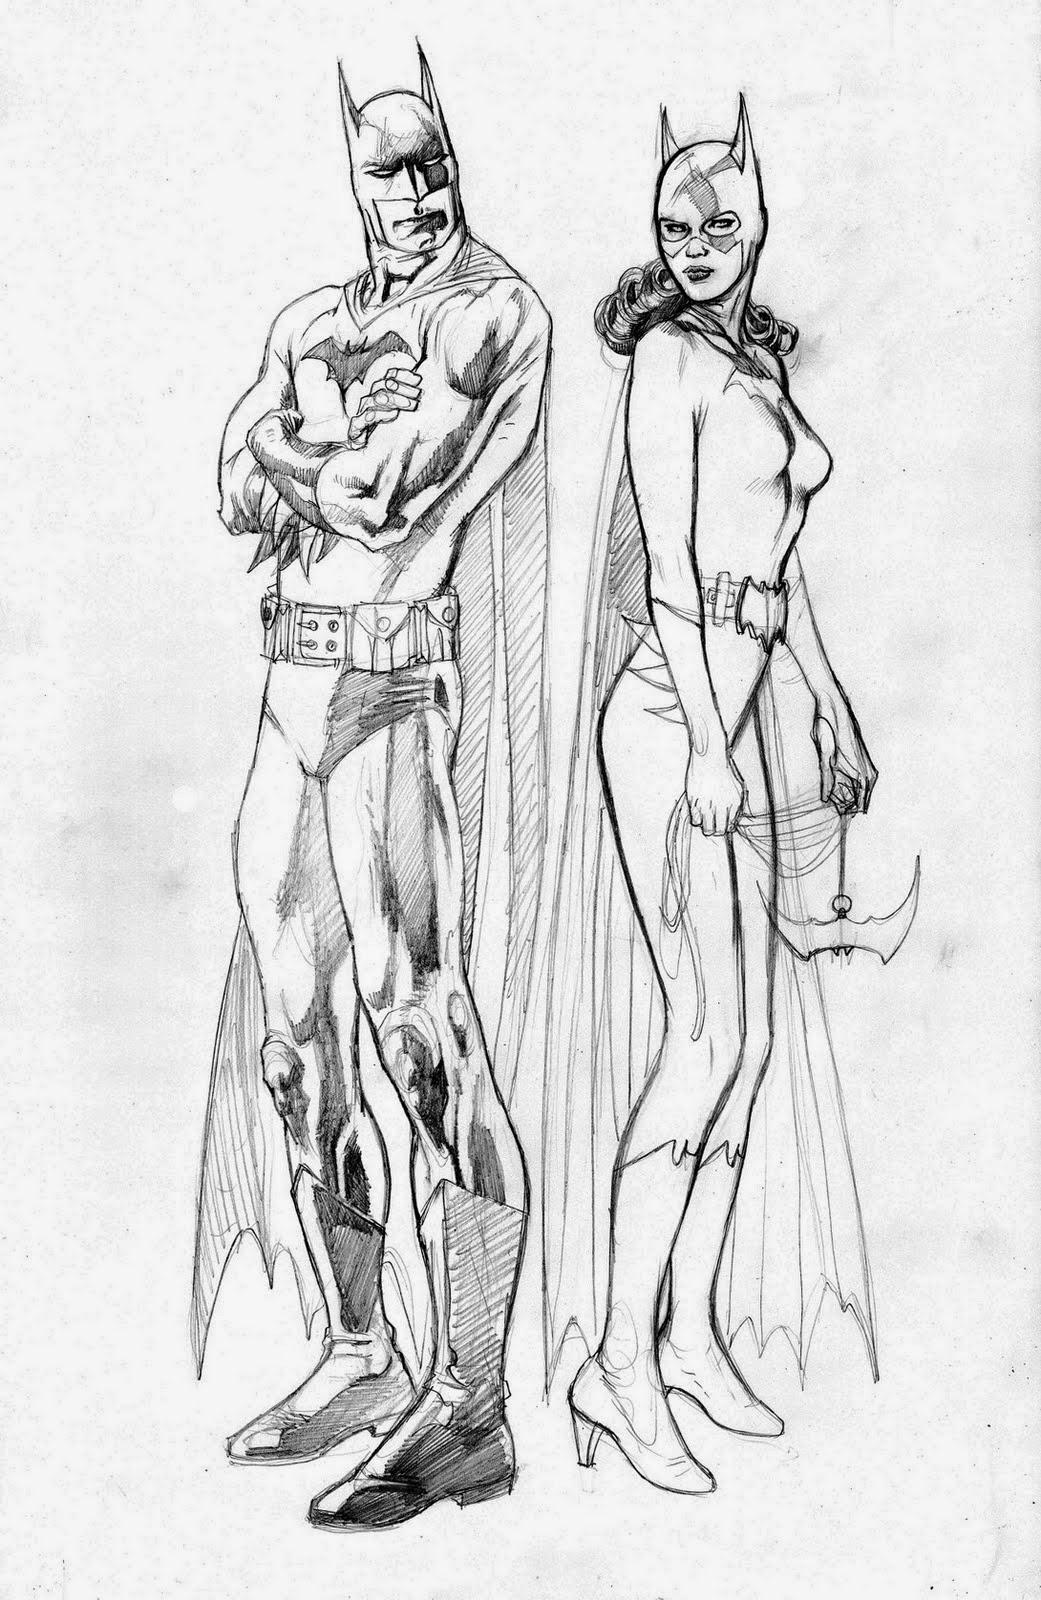 Coloring Pages: Batman Free Downloadable Coloring Pages